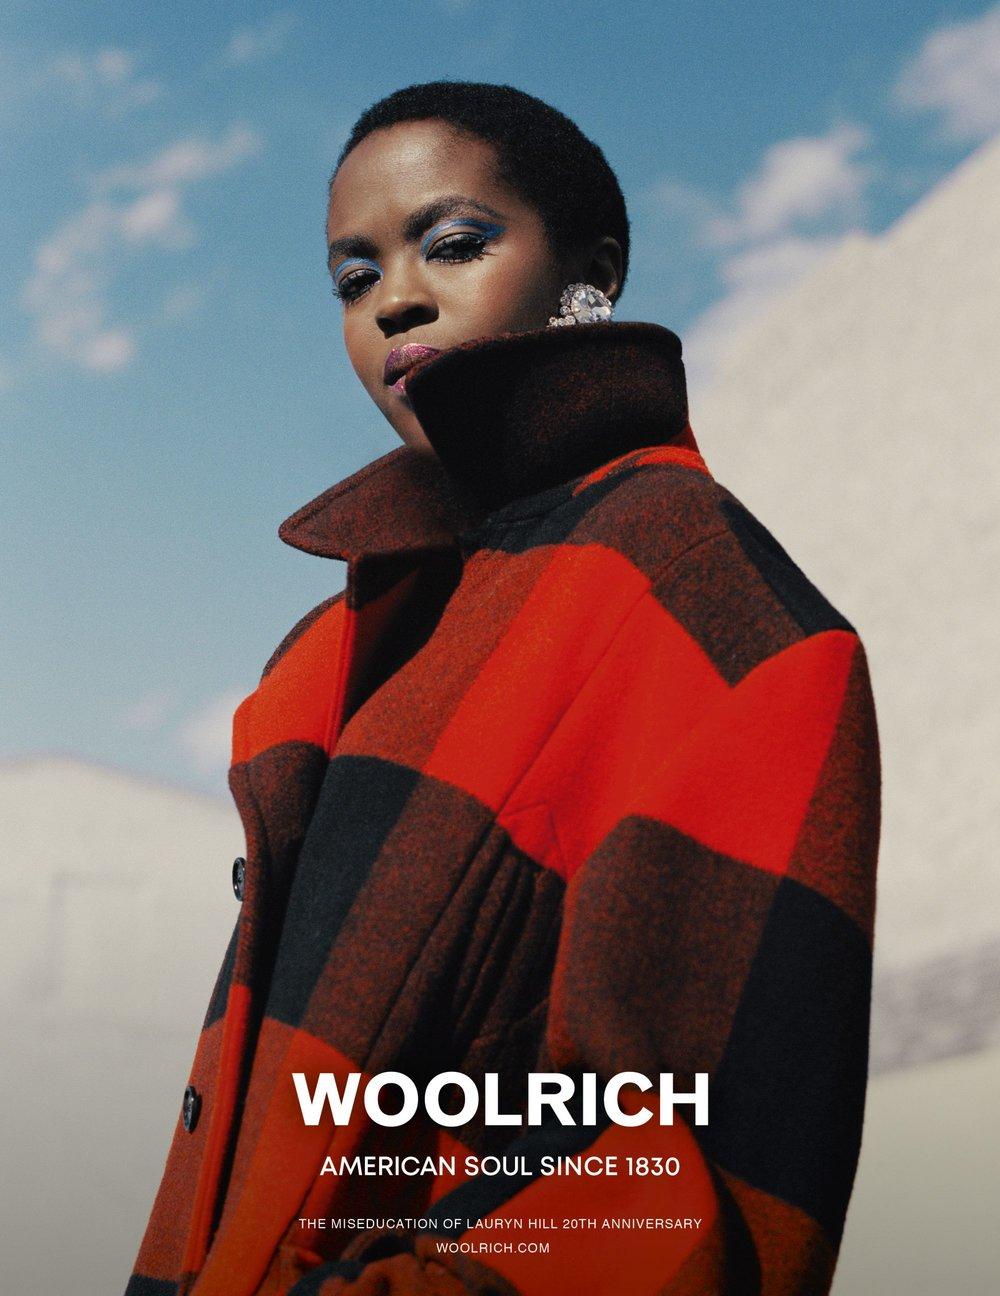 Woolrich-FW-18-ADV-Campaign-1.jpg